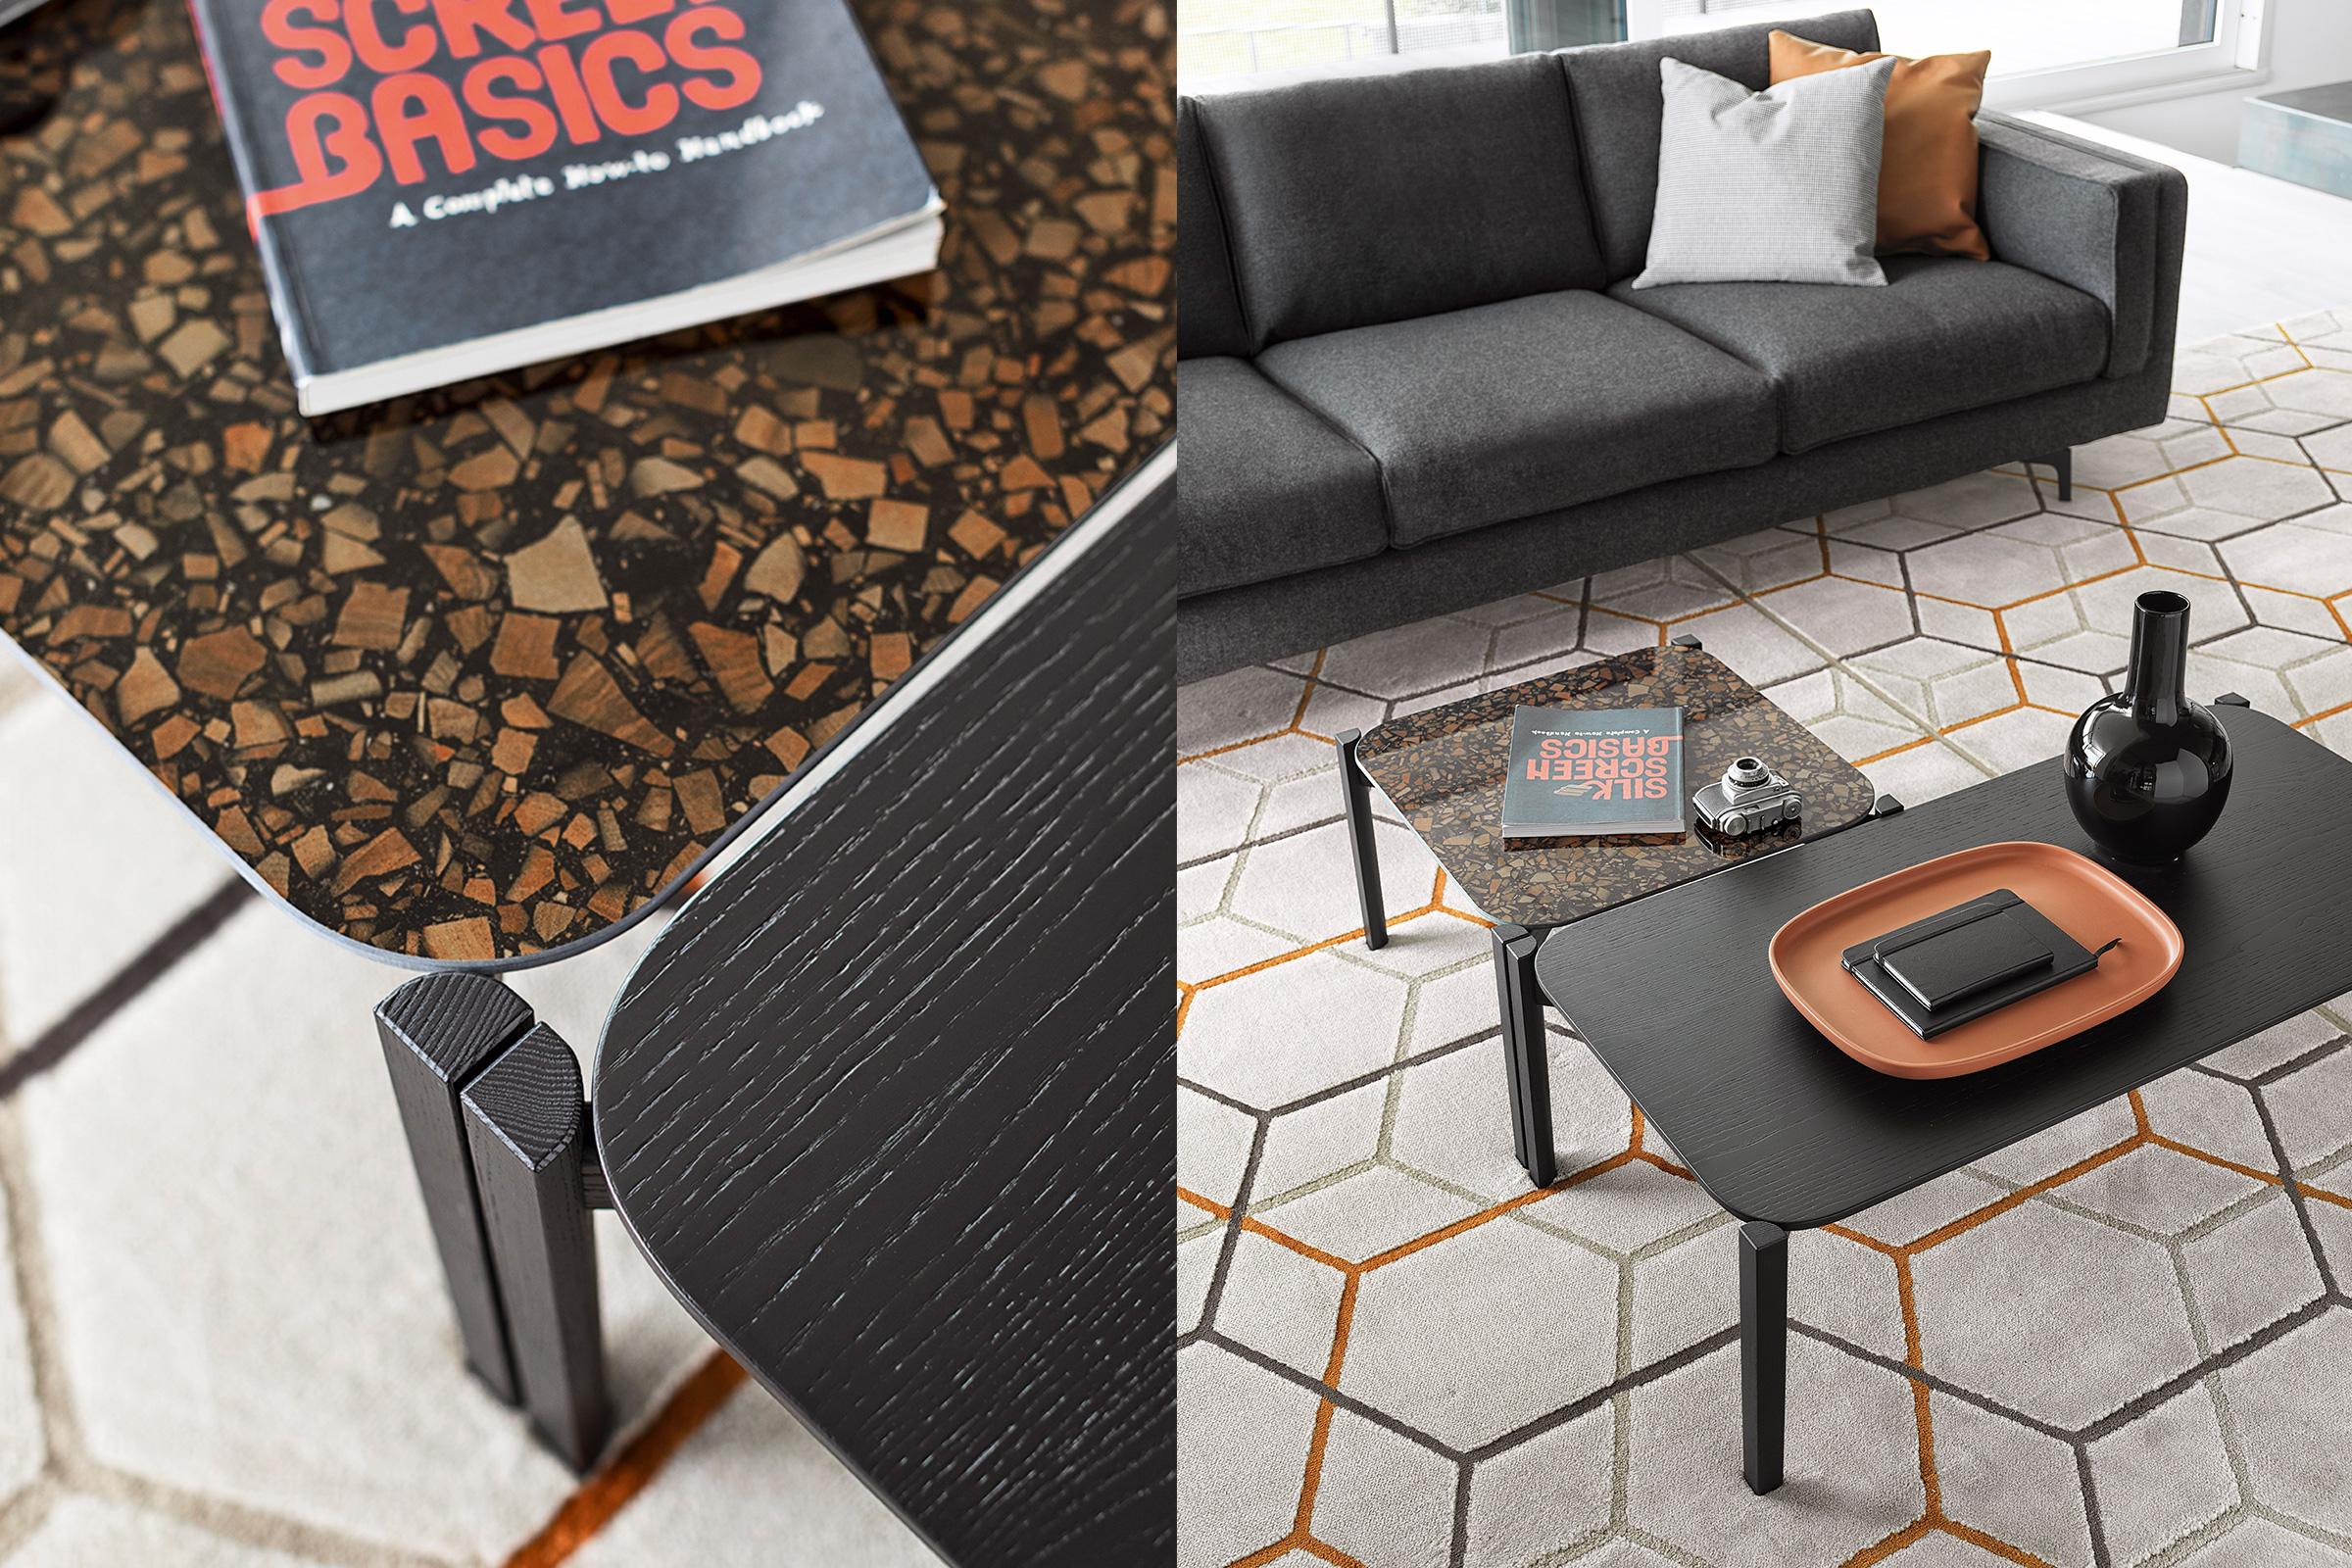 palette Minimalist-Design Coffee Table  Calligaris NYC  New York City   Soho  Chelsea  Upper East Side